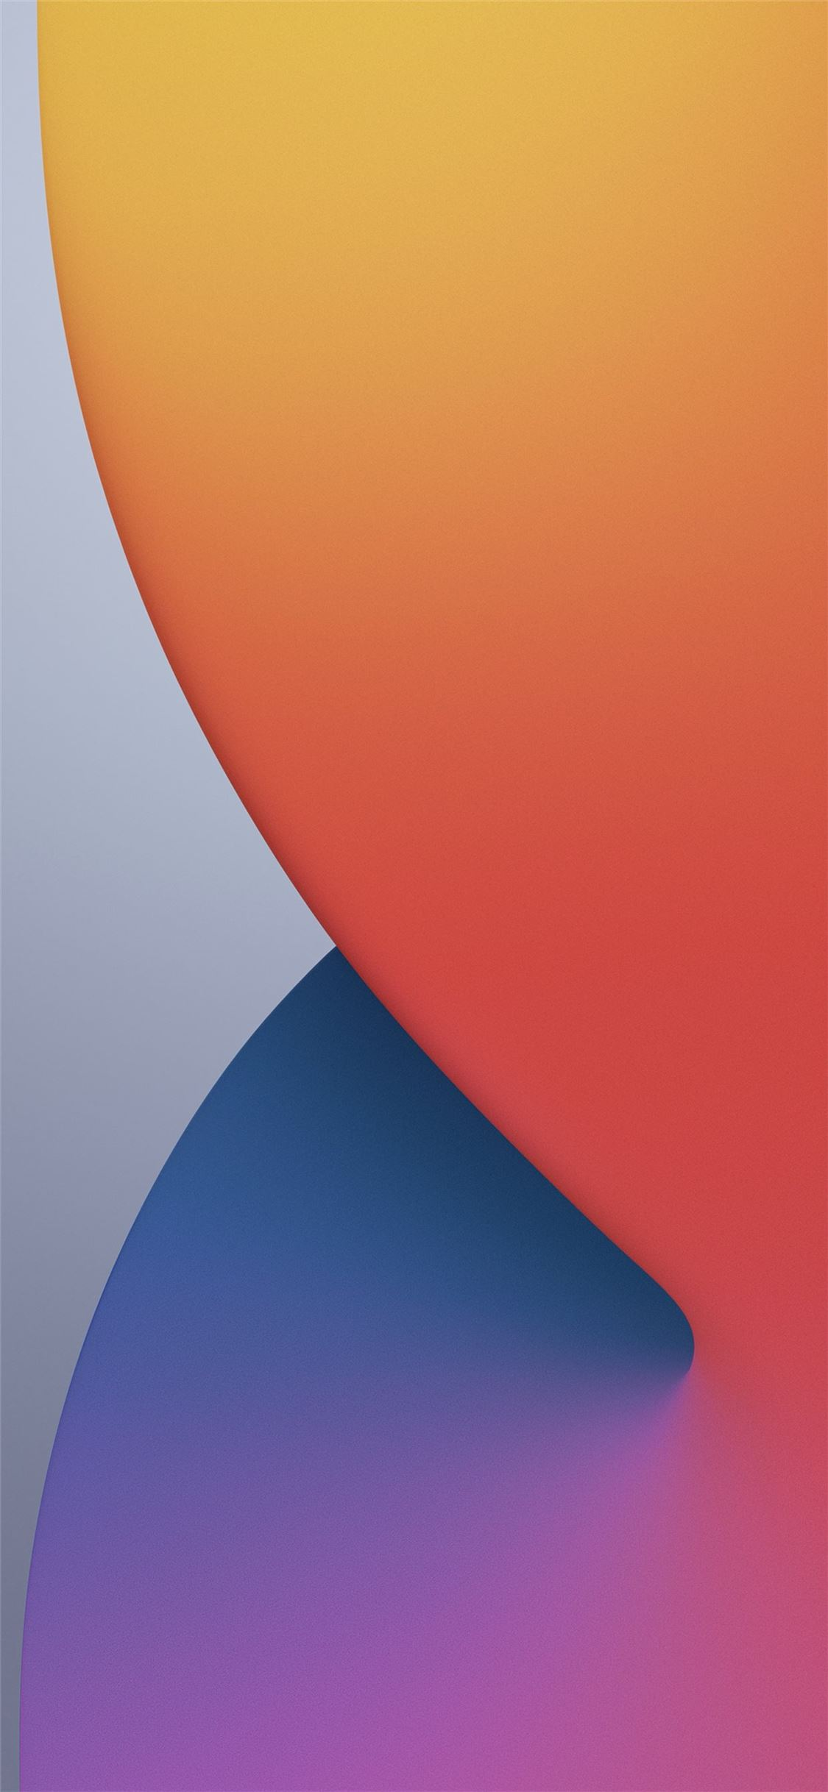 Best Aesthetic Iphone 11 Wallpapers Hd Ilikewallpaper